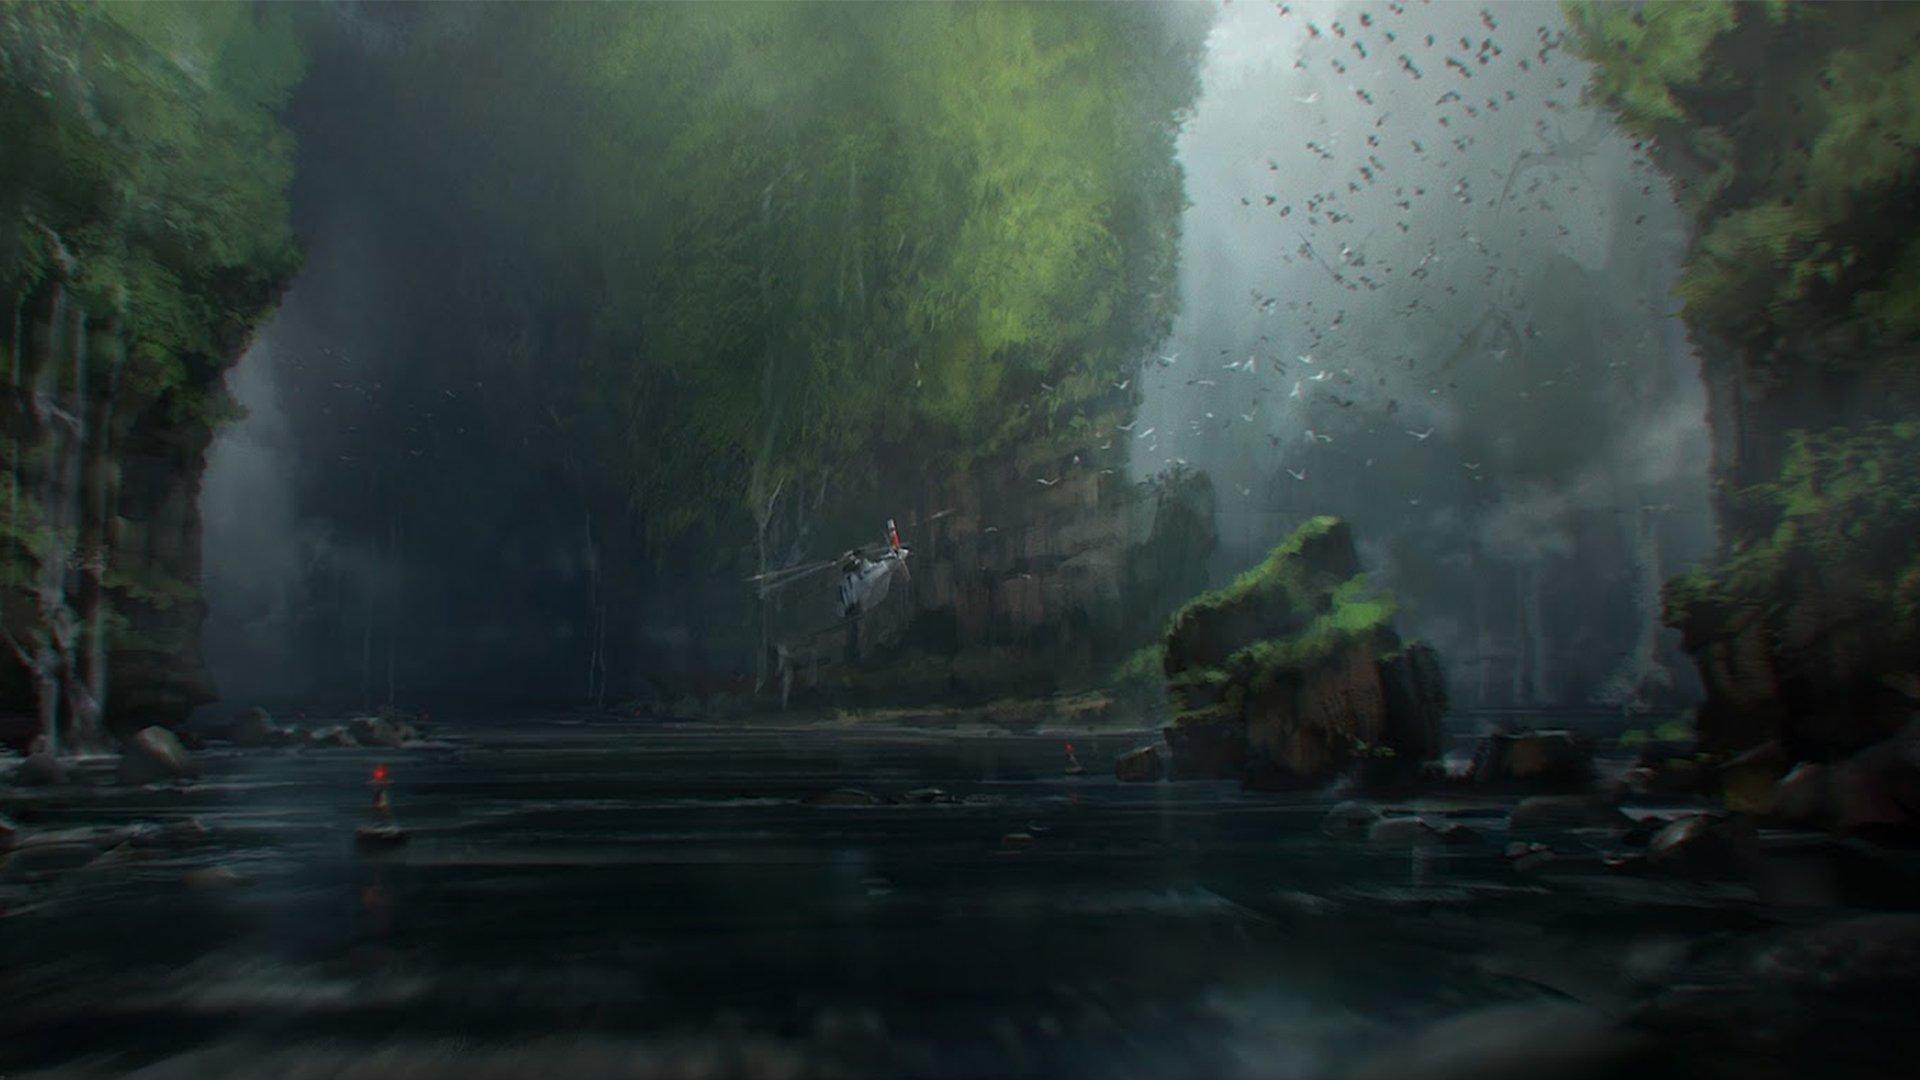 Avatar Wallpaper Hd 3d Jurassic Park 3d Full Hd Wallpaper And Background Image